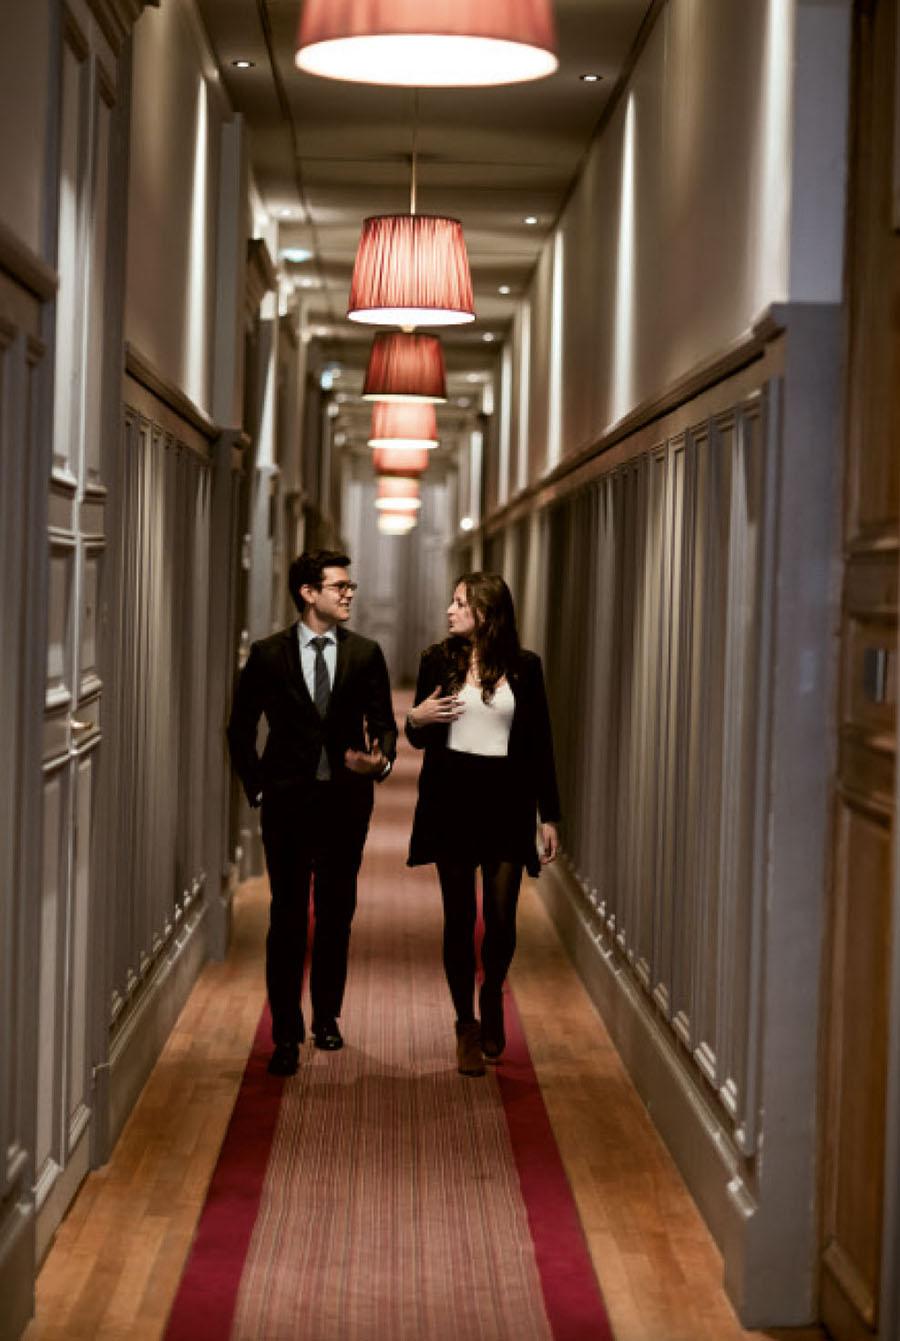 ODDO_BHF_hallway